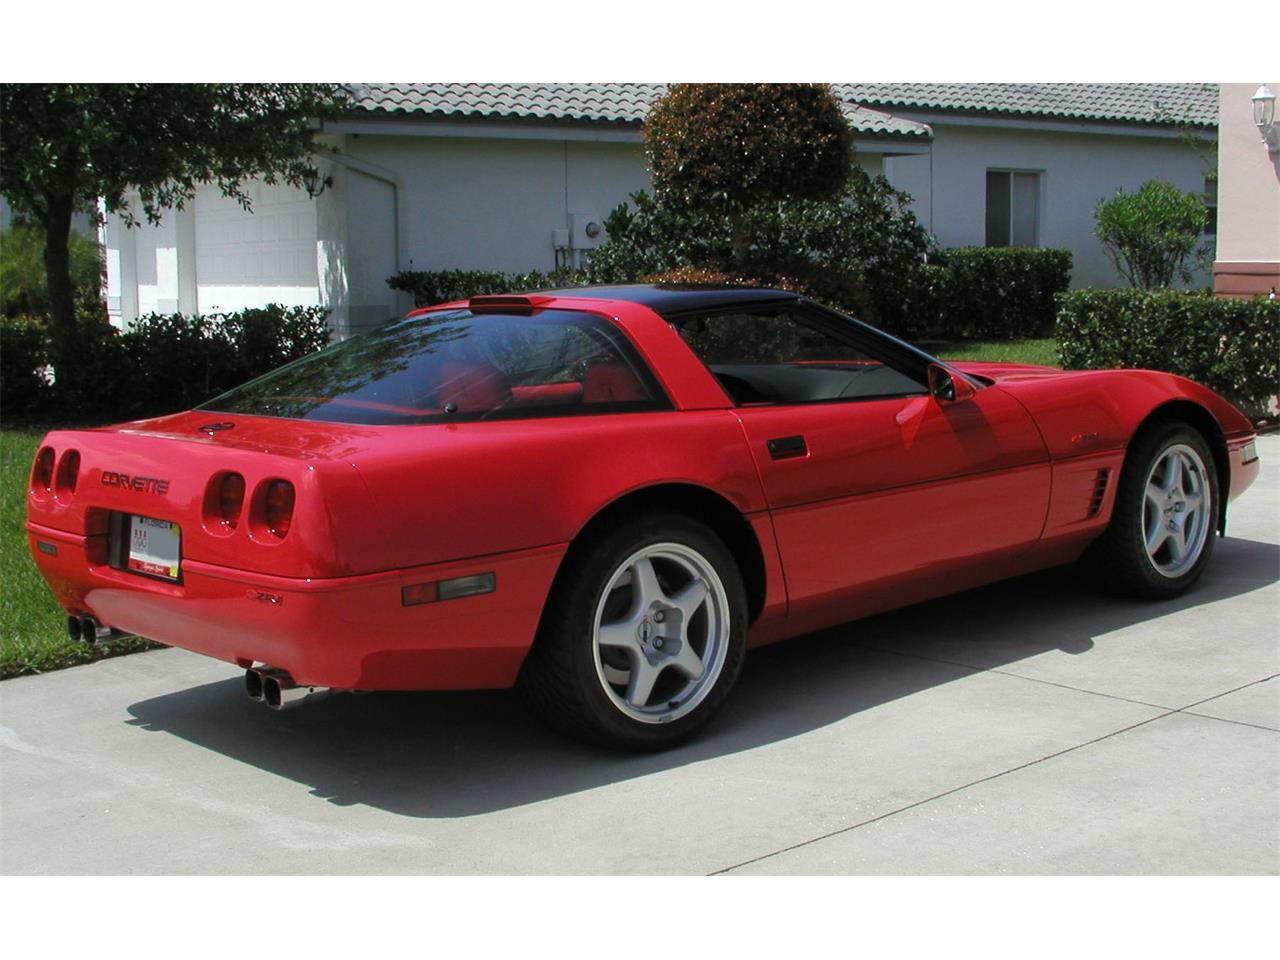 1995 chevrolet corvette zr1 for sale cc 1078504. Black Bedroom Furniture Sets. Home Design Ideas